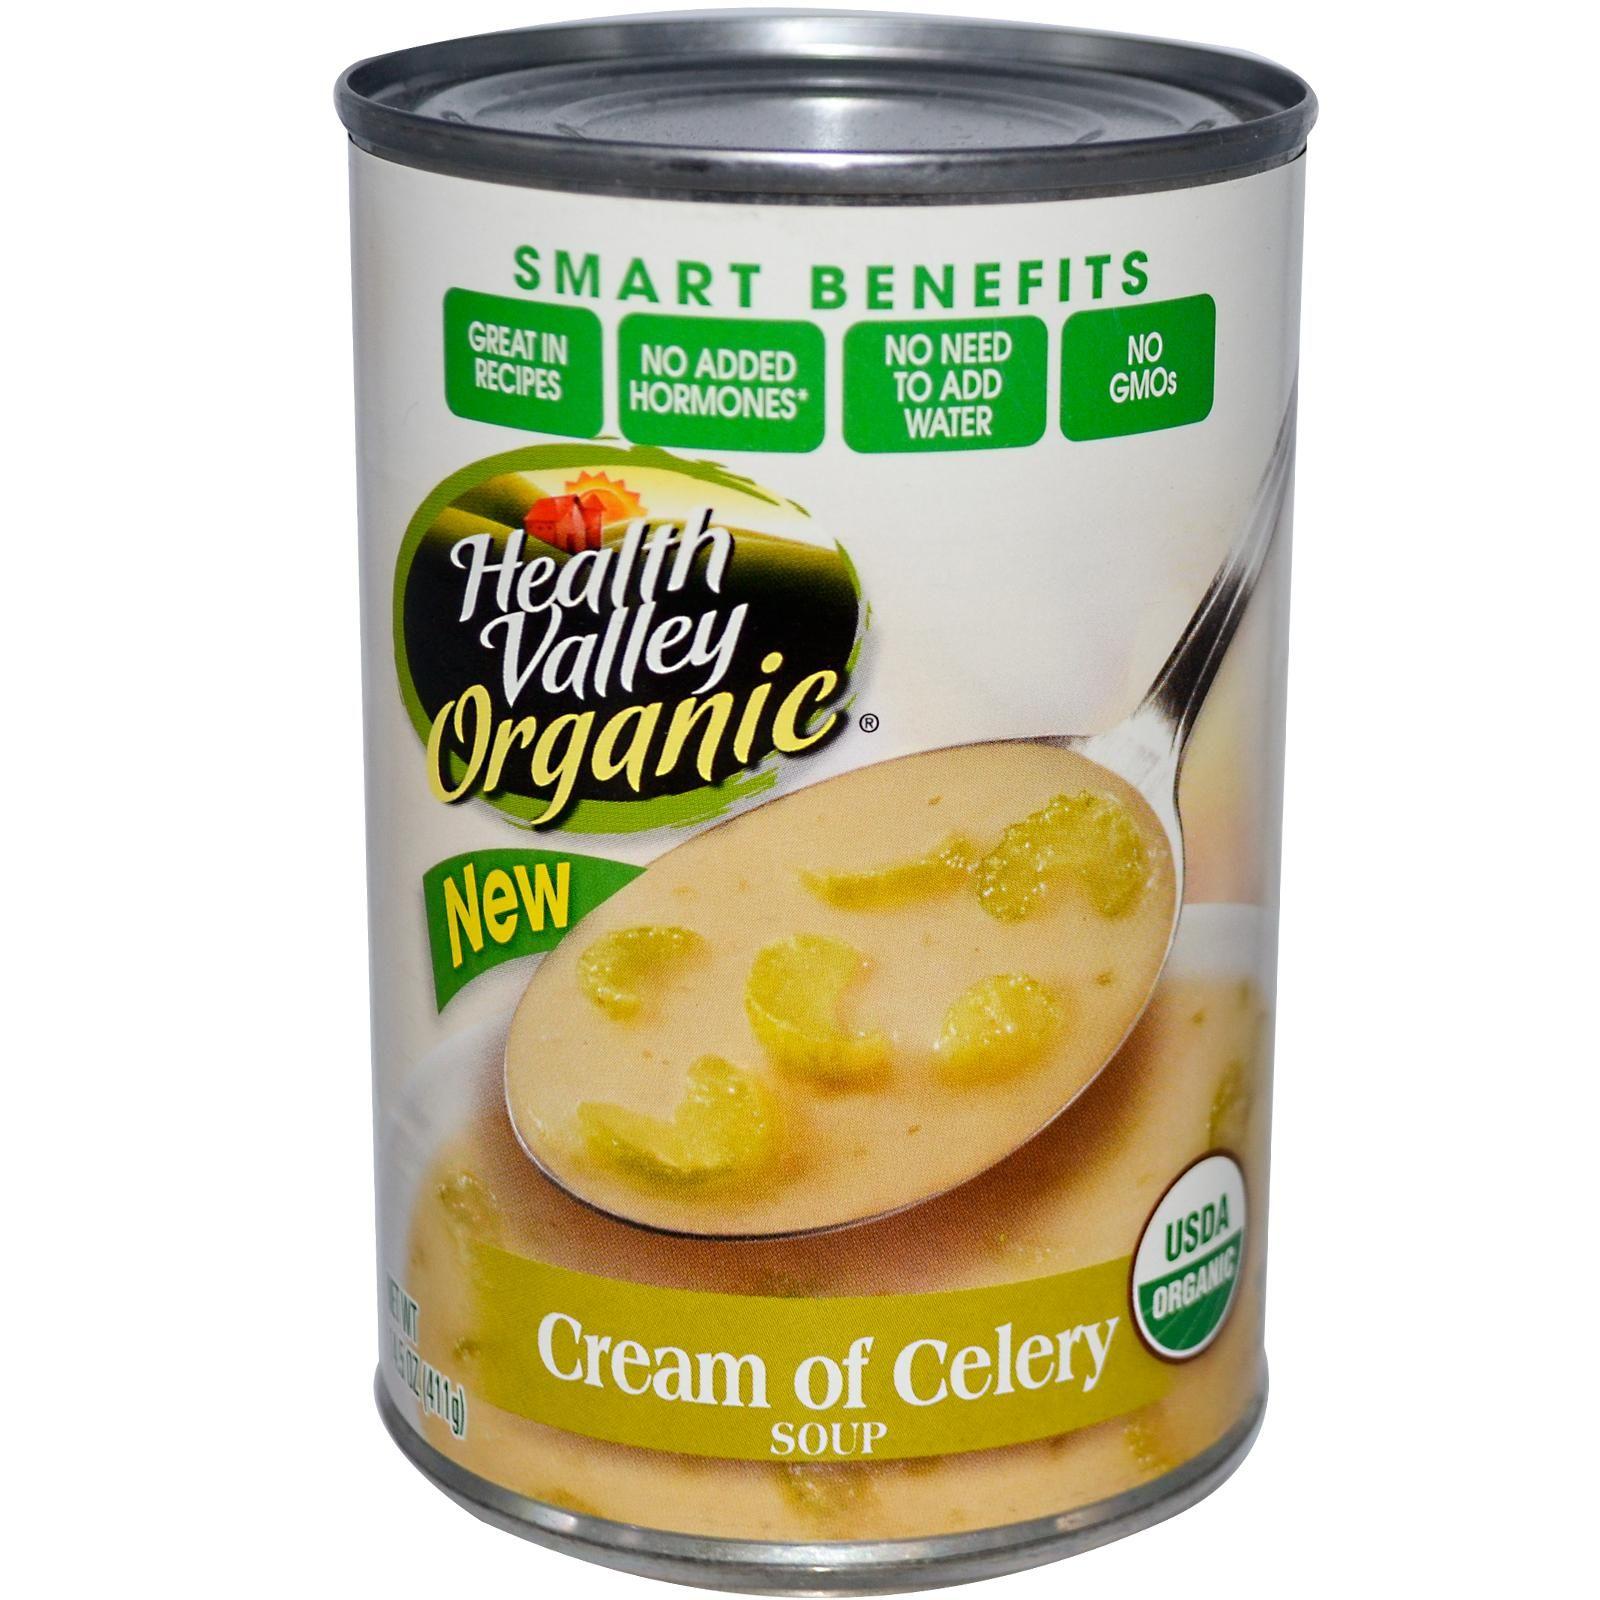 Health Valley, Organic Soup, Cream of Celery, 14.5 oz (411